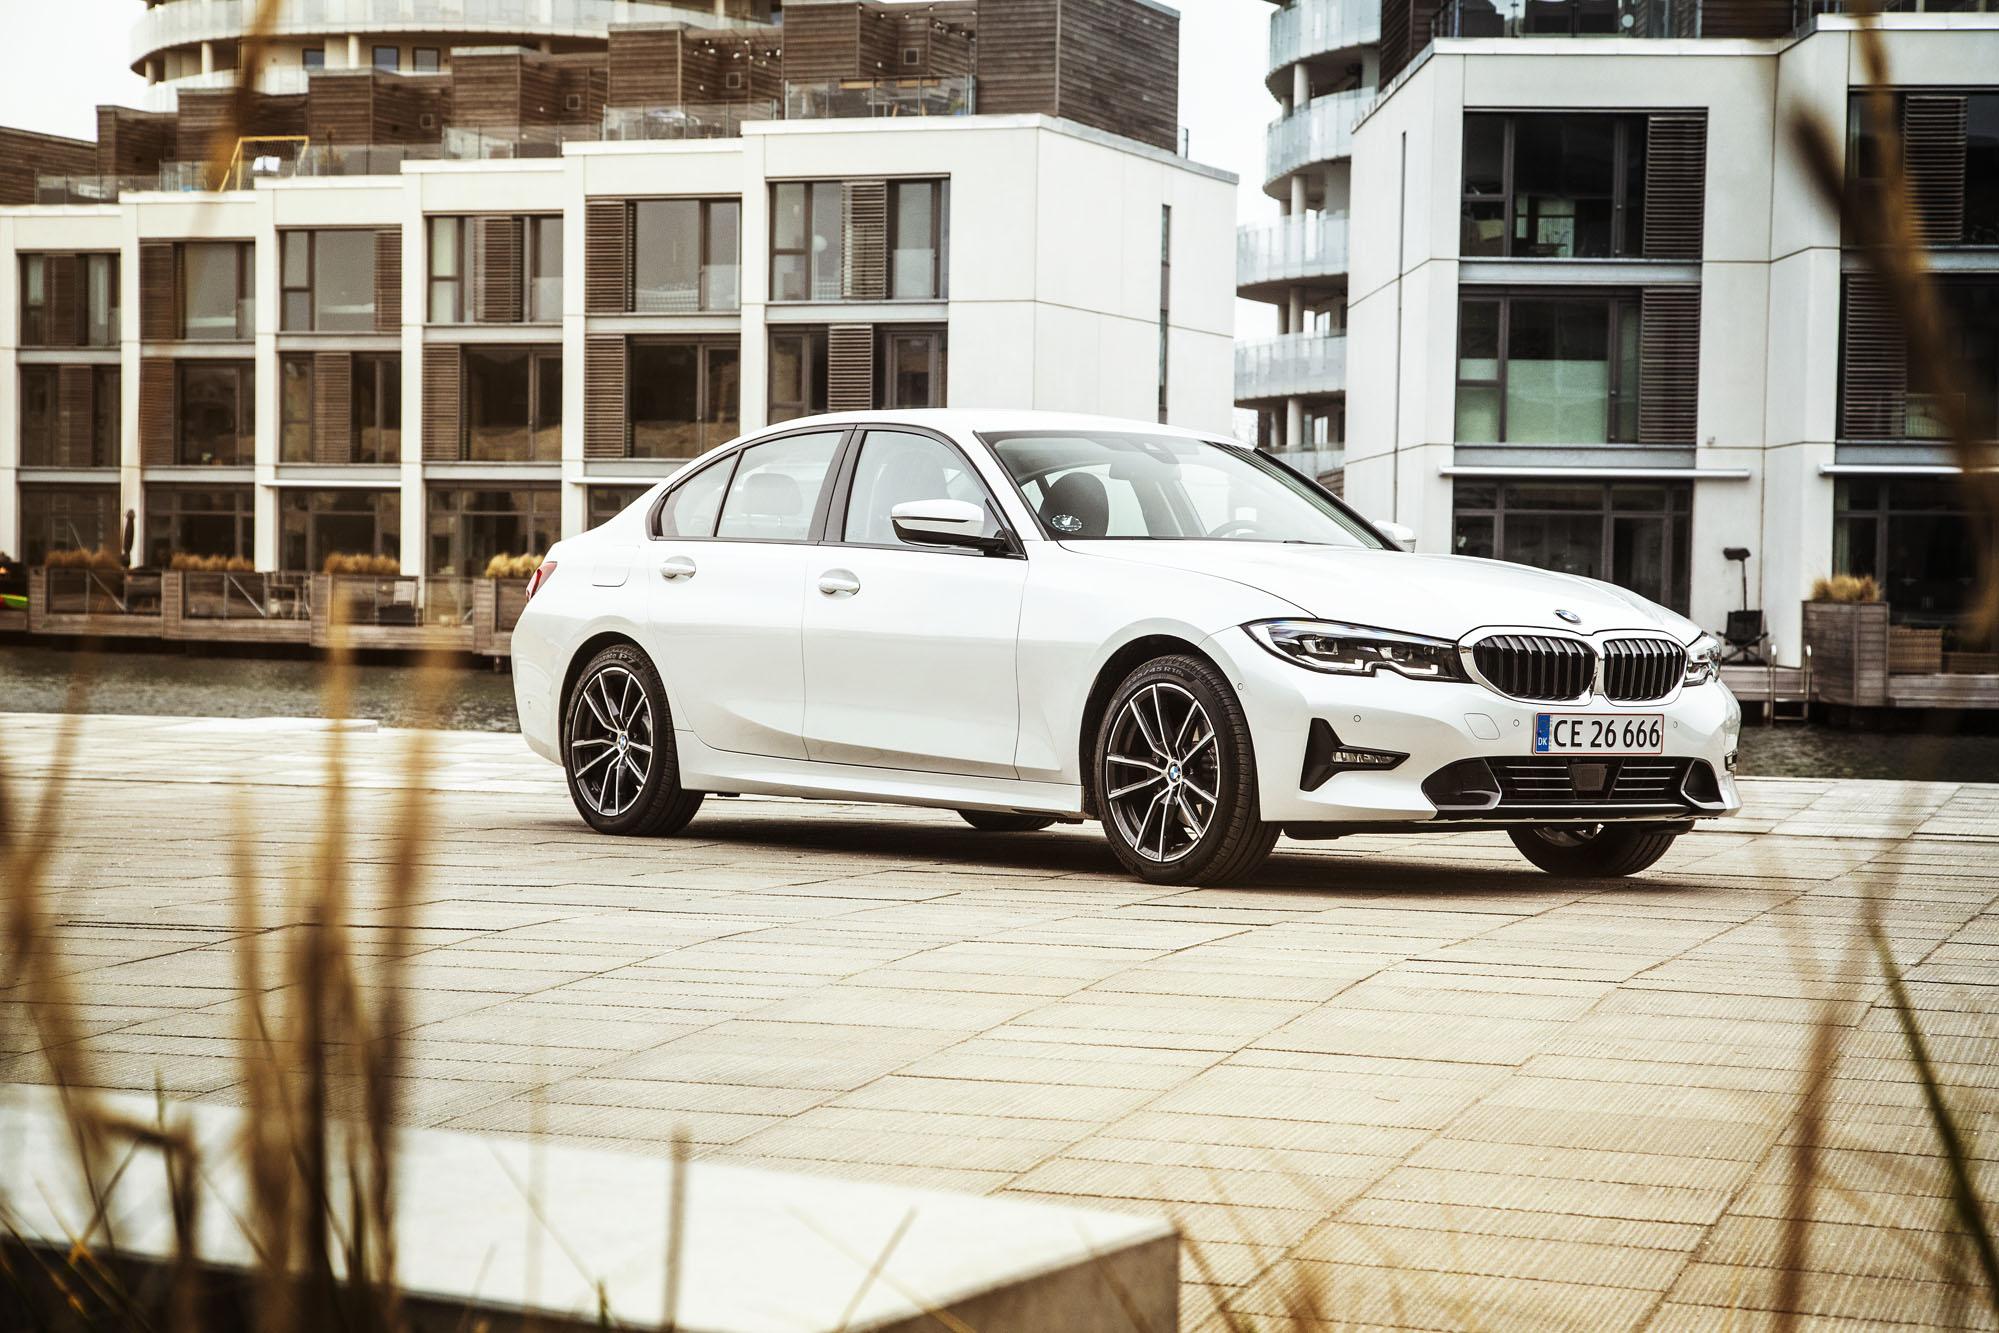 BMW_3-serie_01.jpg